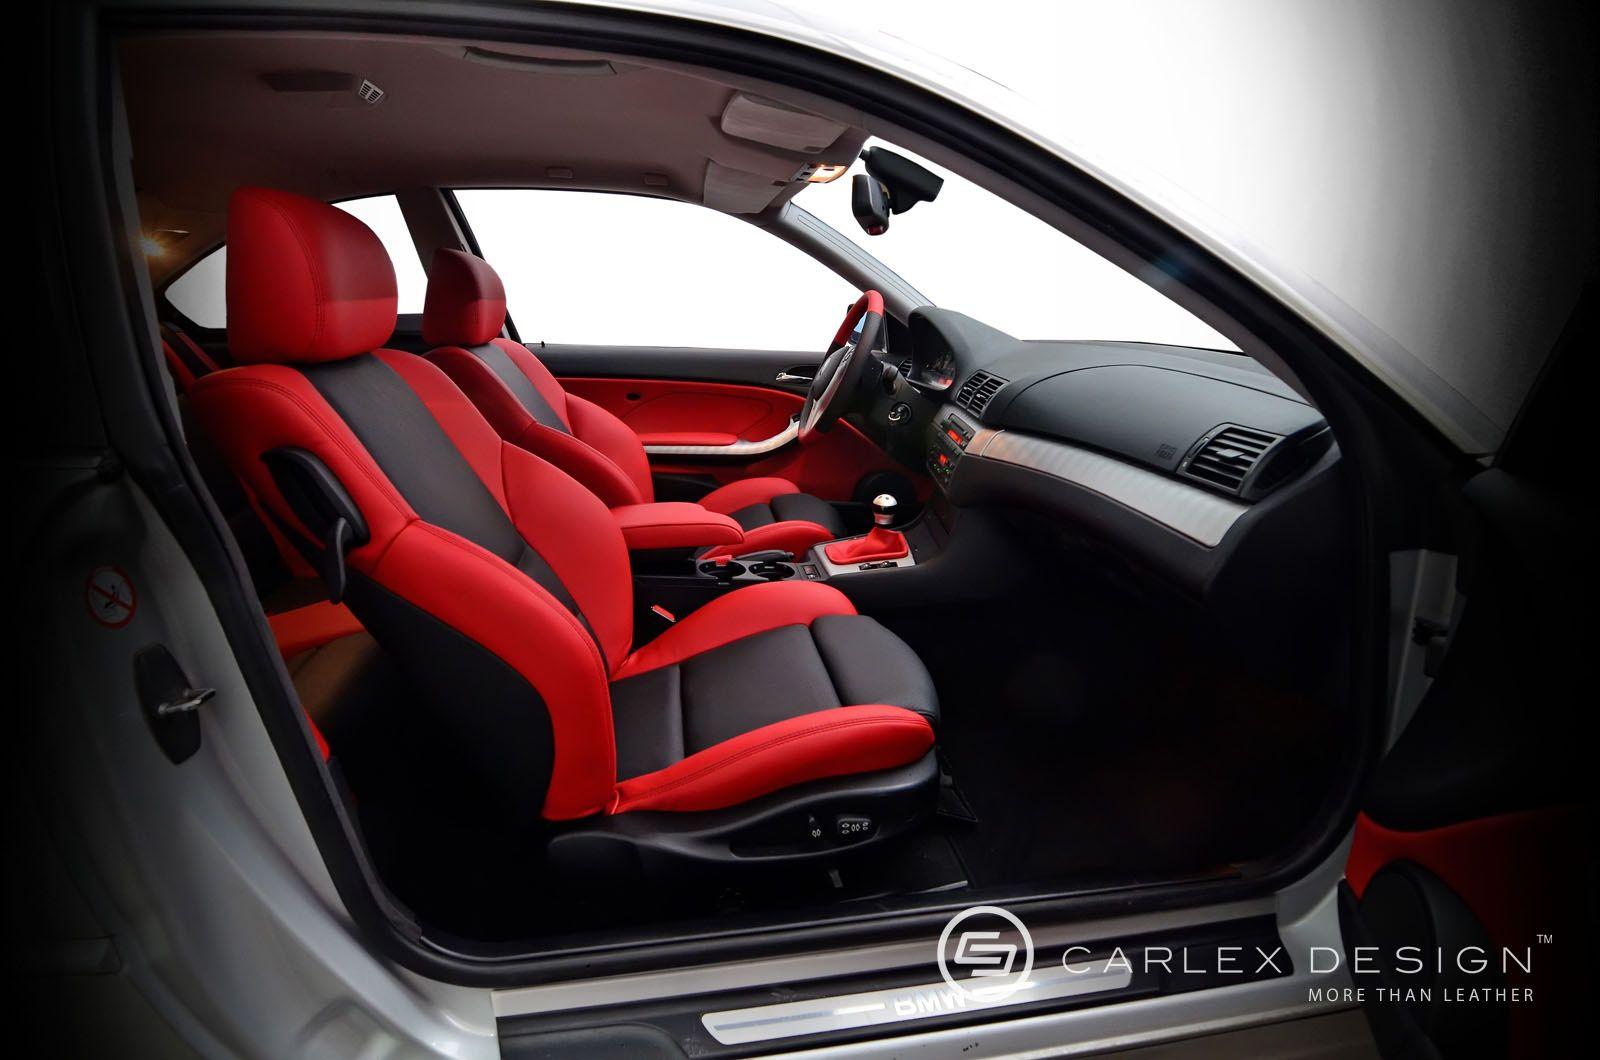 Bmw E46 Silver 3 Series Custom Interior Red And Black Grey Awesome Carlex Design